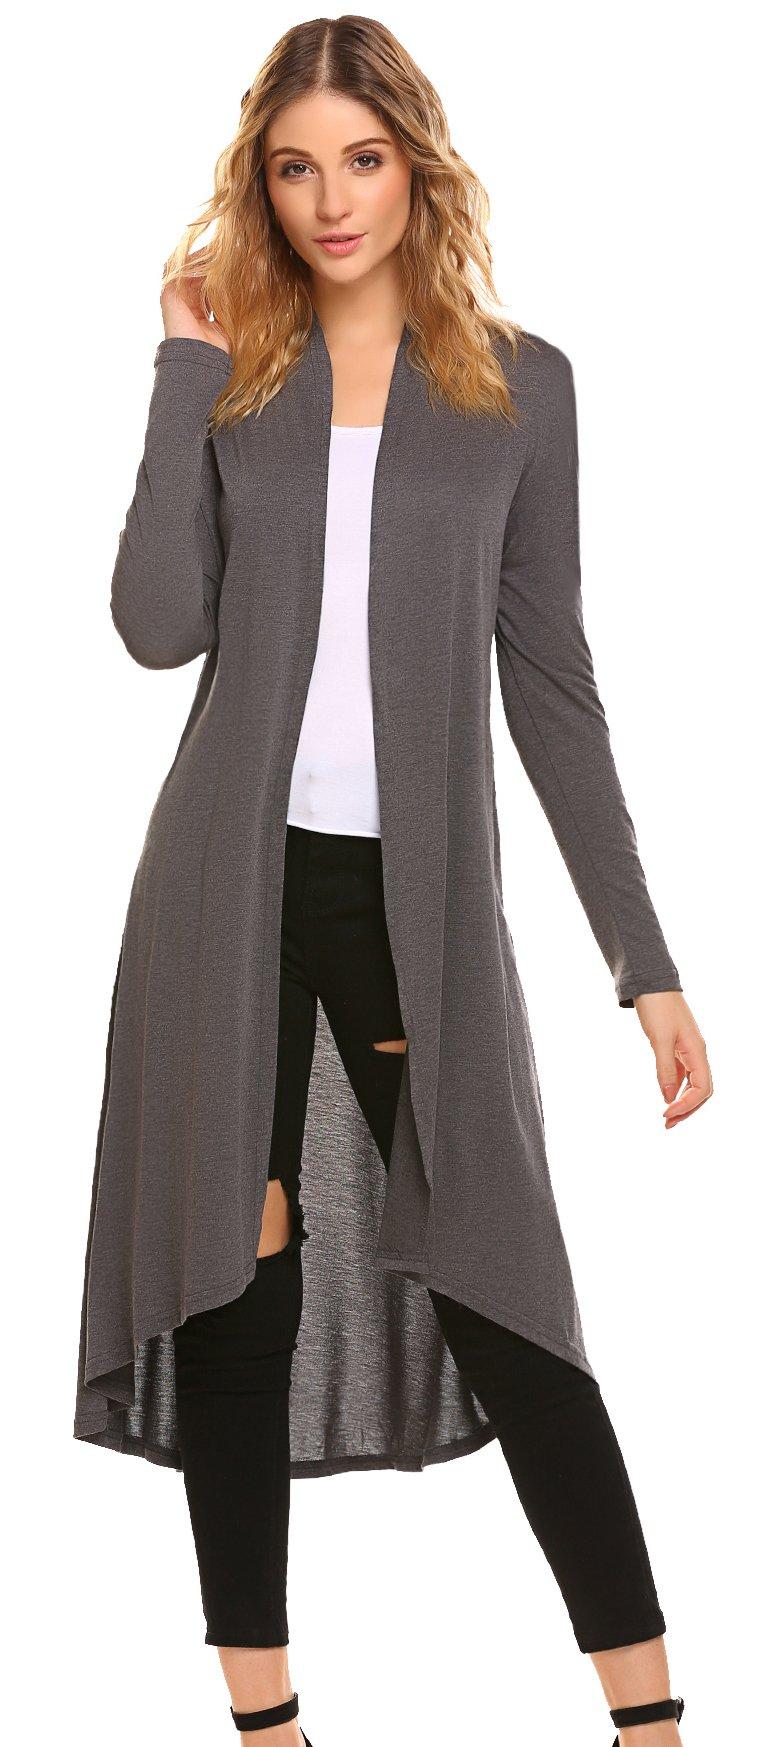 S-3XL Womens Casual Long Open Front Drape Lightweight Duster High Low Hem Maxi Long Sleeve Cardigan